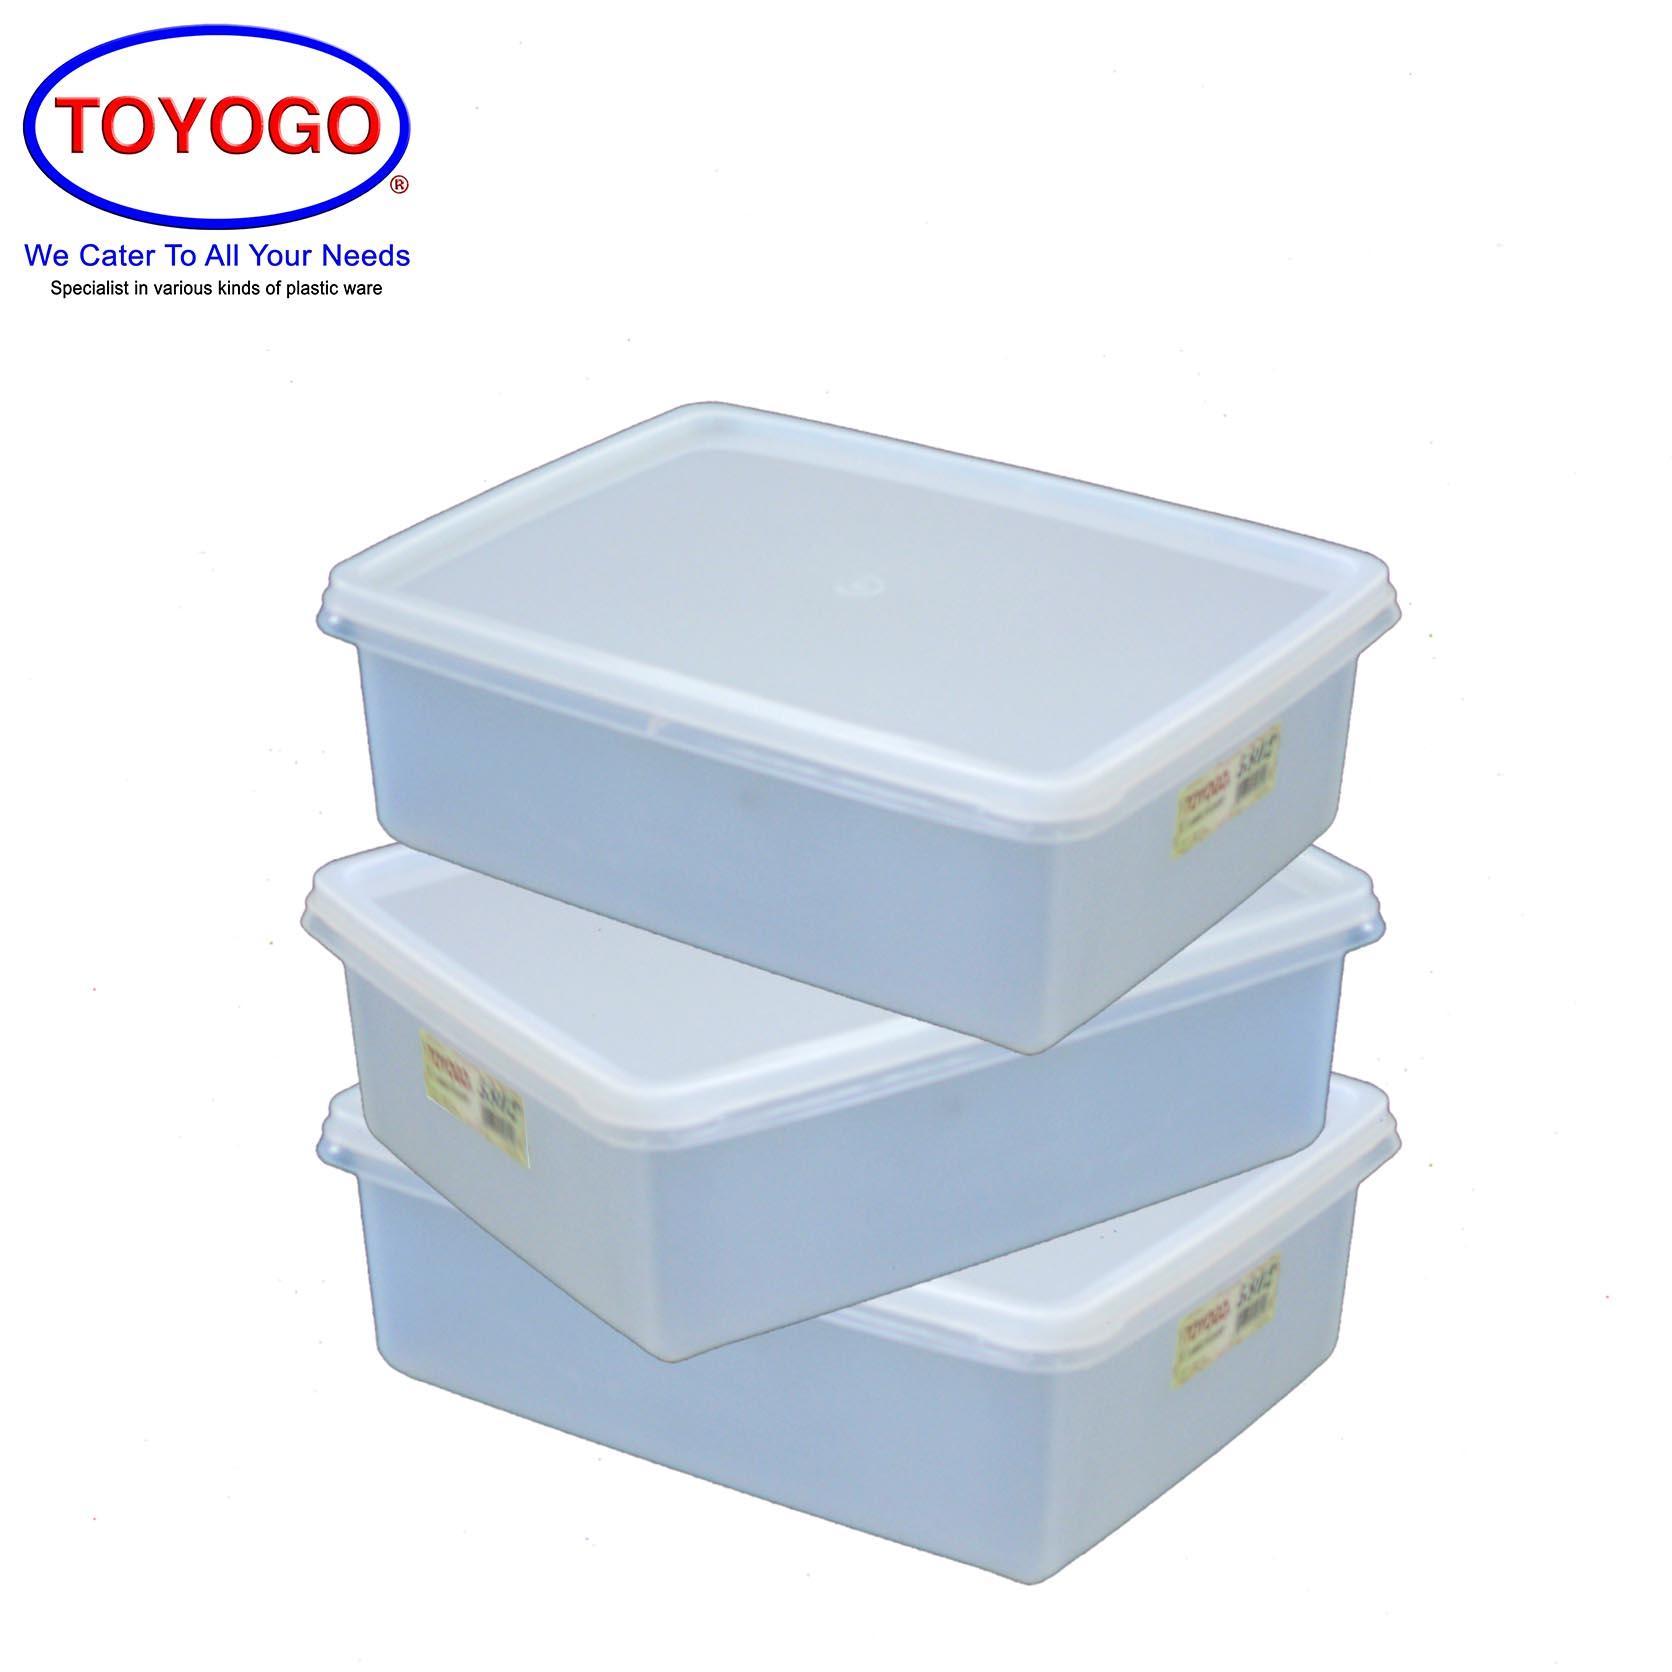 Toyogo [Bundle of 3] Plastic Storage Container Box [5802]